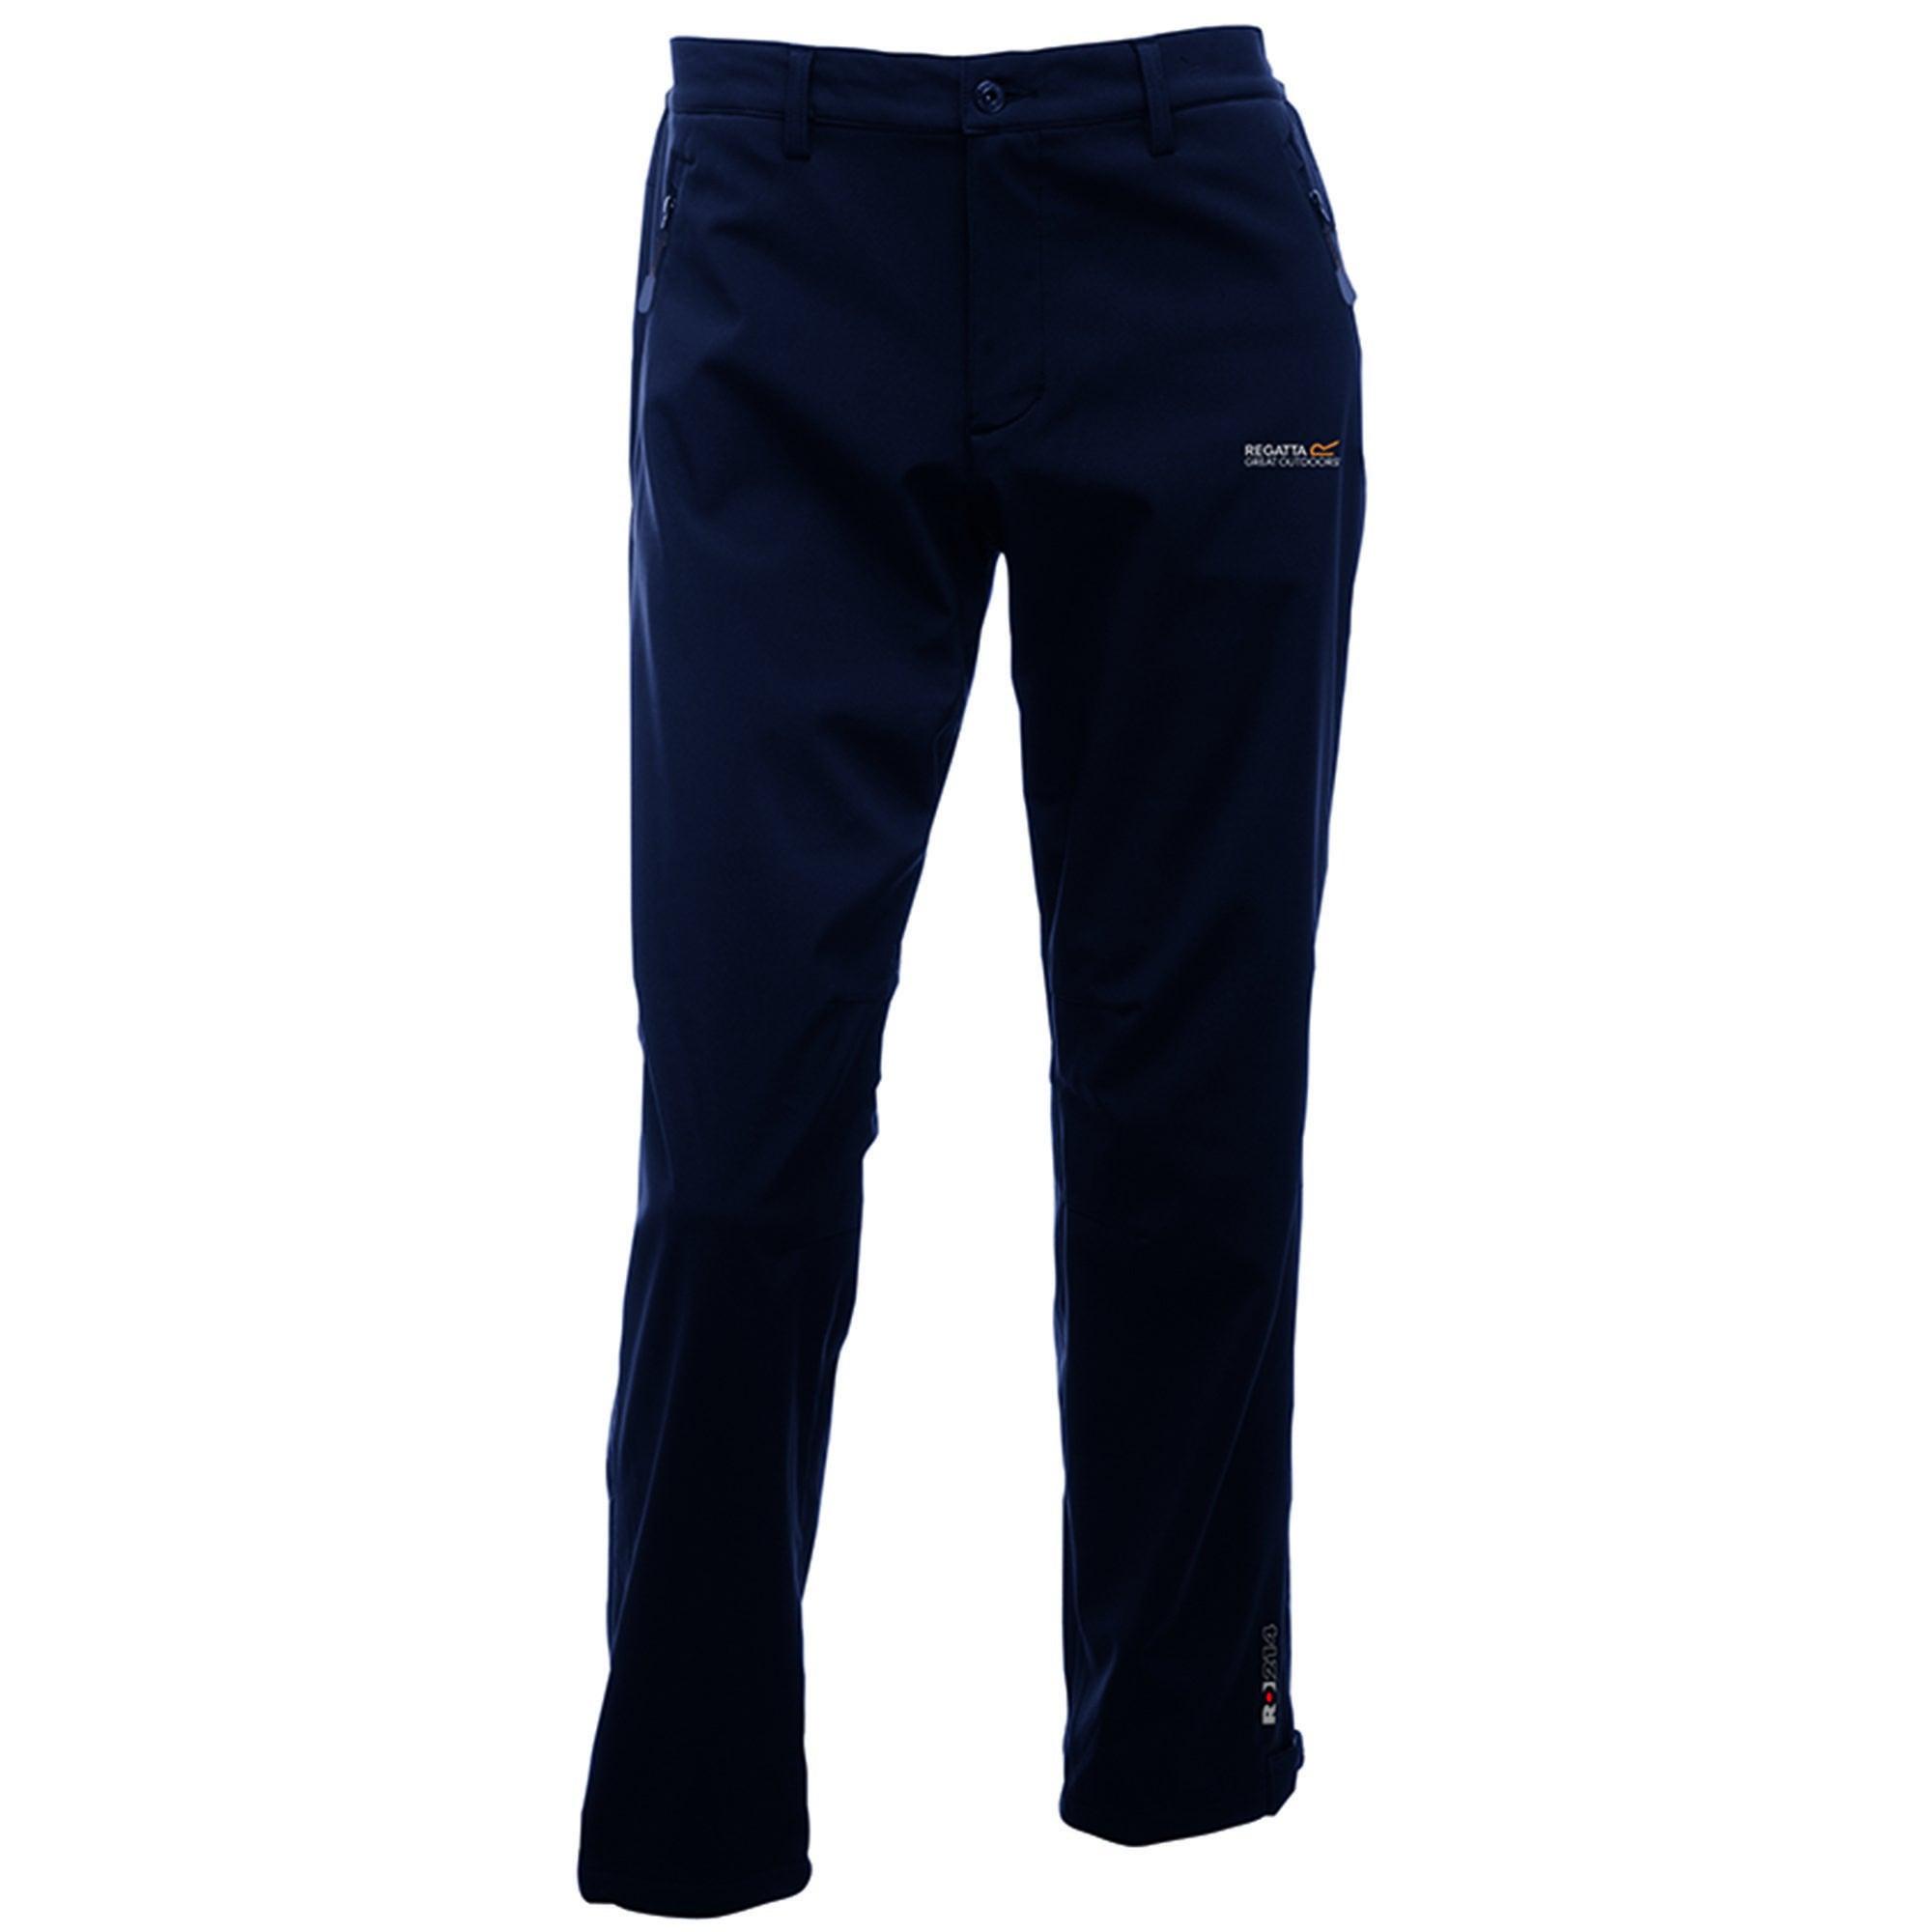 Regatta Great Outdoors Mens Adventure Tech Geo II Regular Leg Softshell Trousers